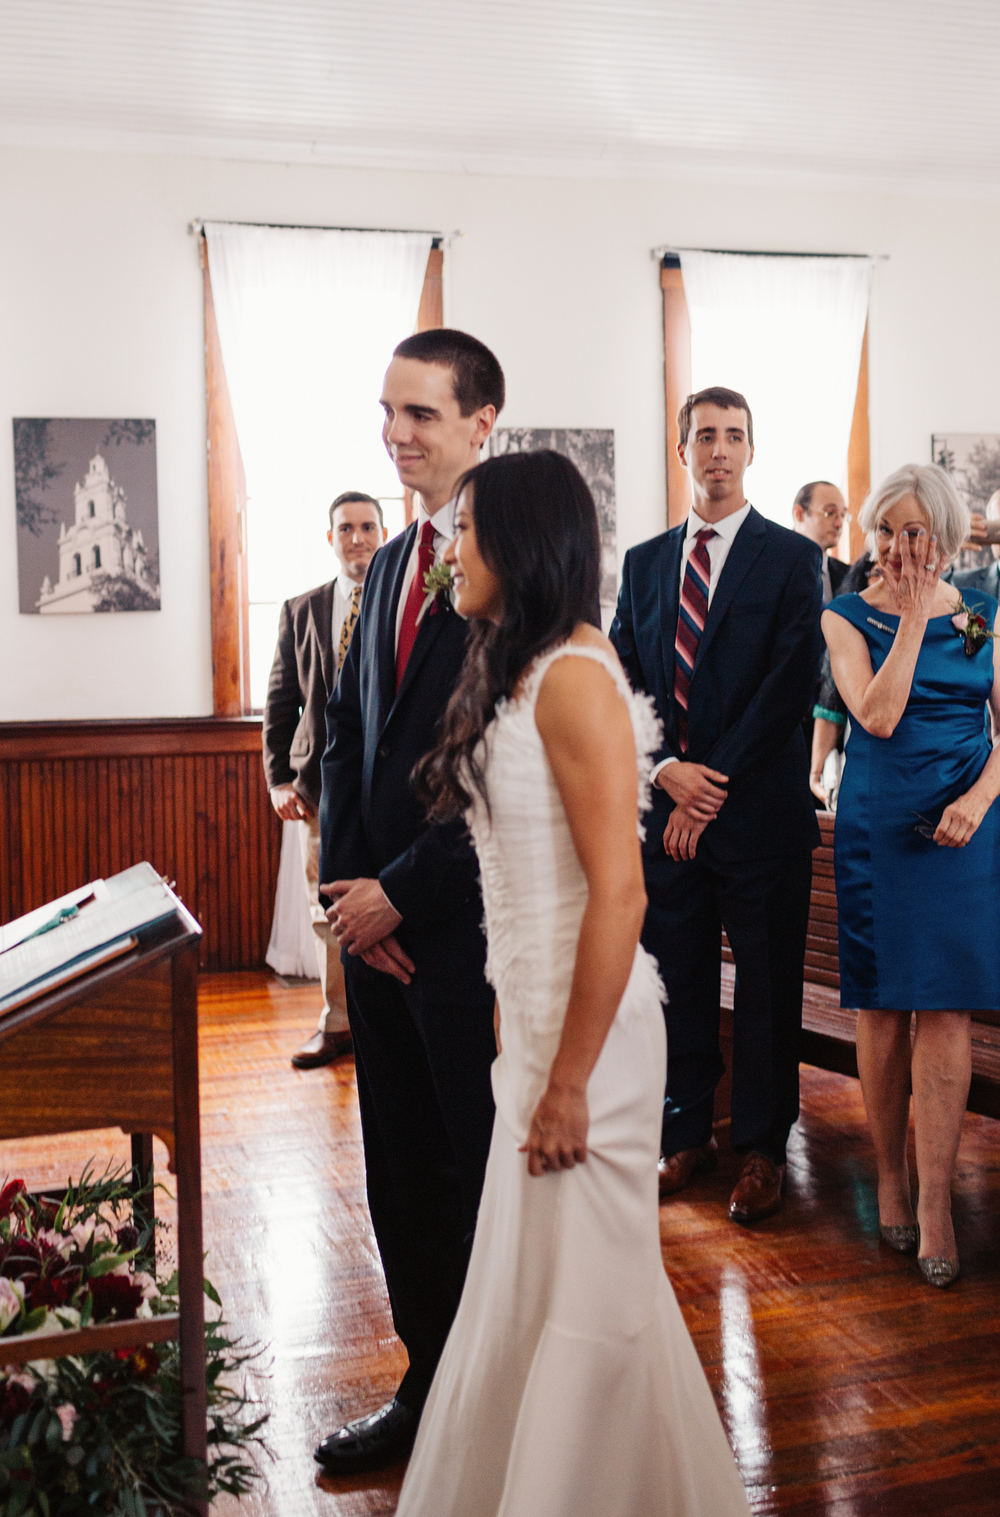 Wedding Day | Vanessa Boy Photography | vanessaboy.com-158.com final.jpg